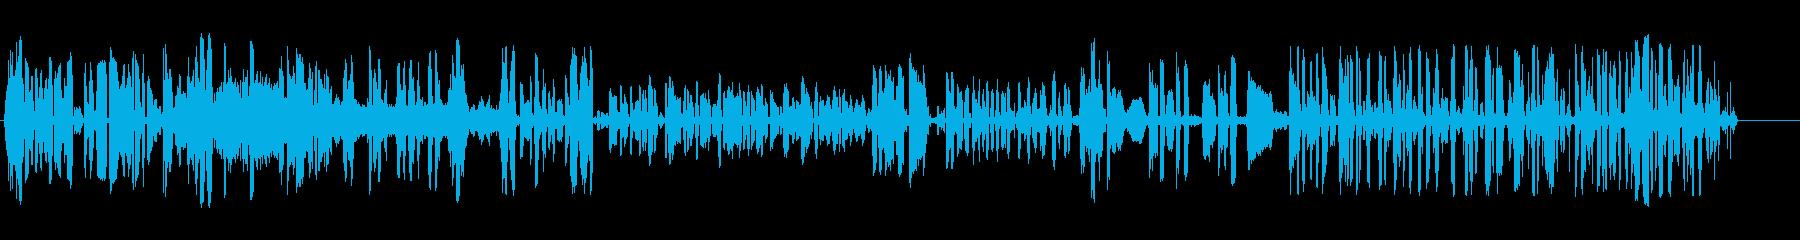 Murmur Voices Rad...の再生済みの波形